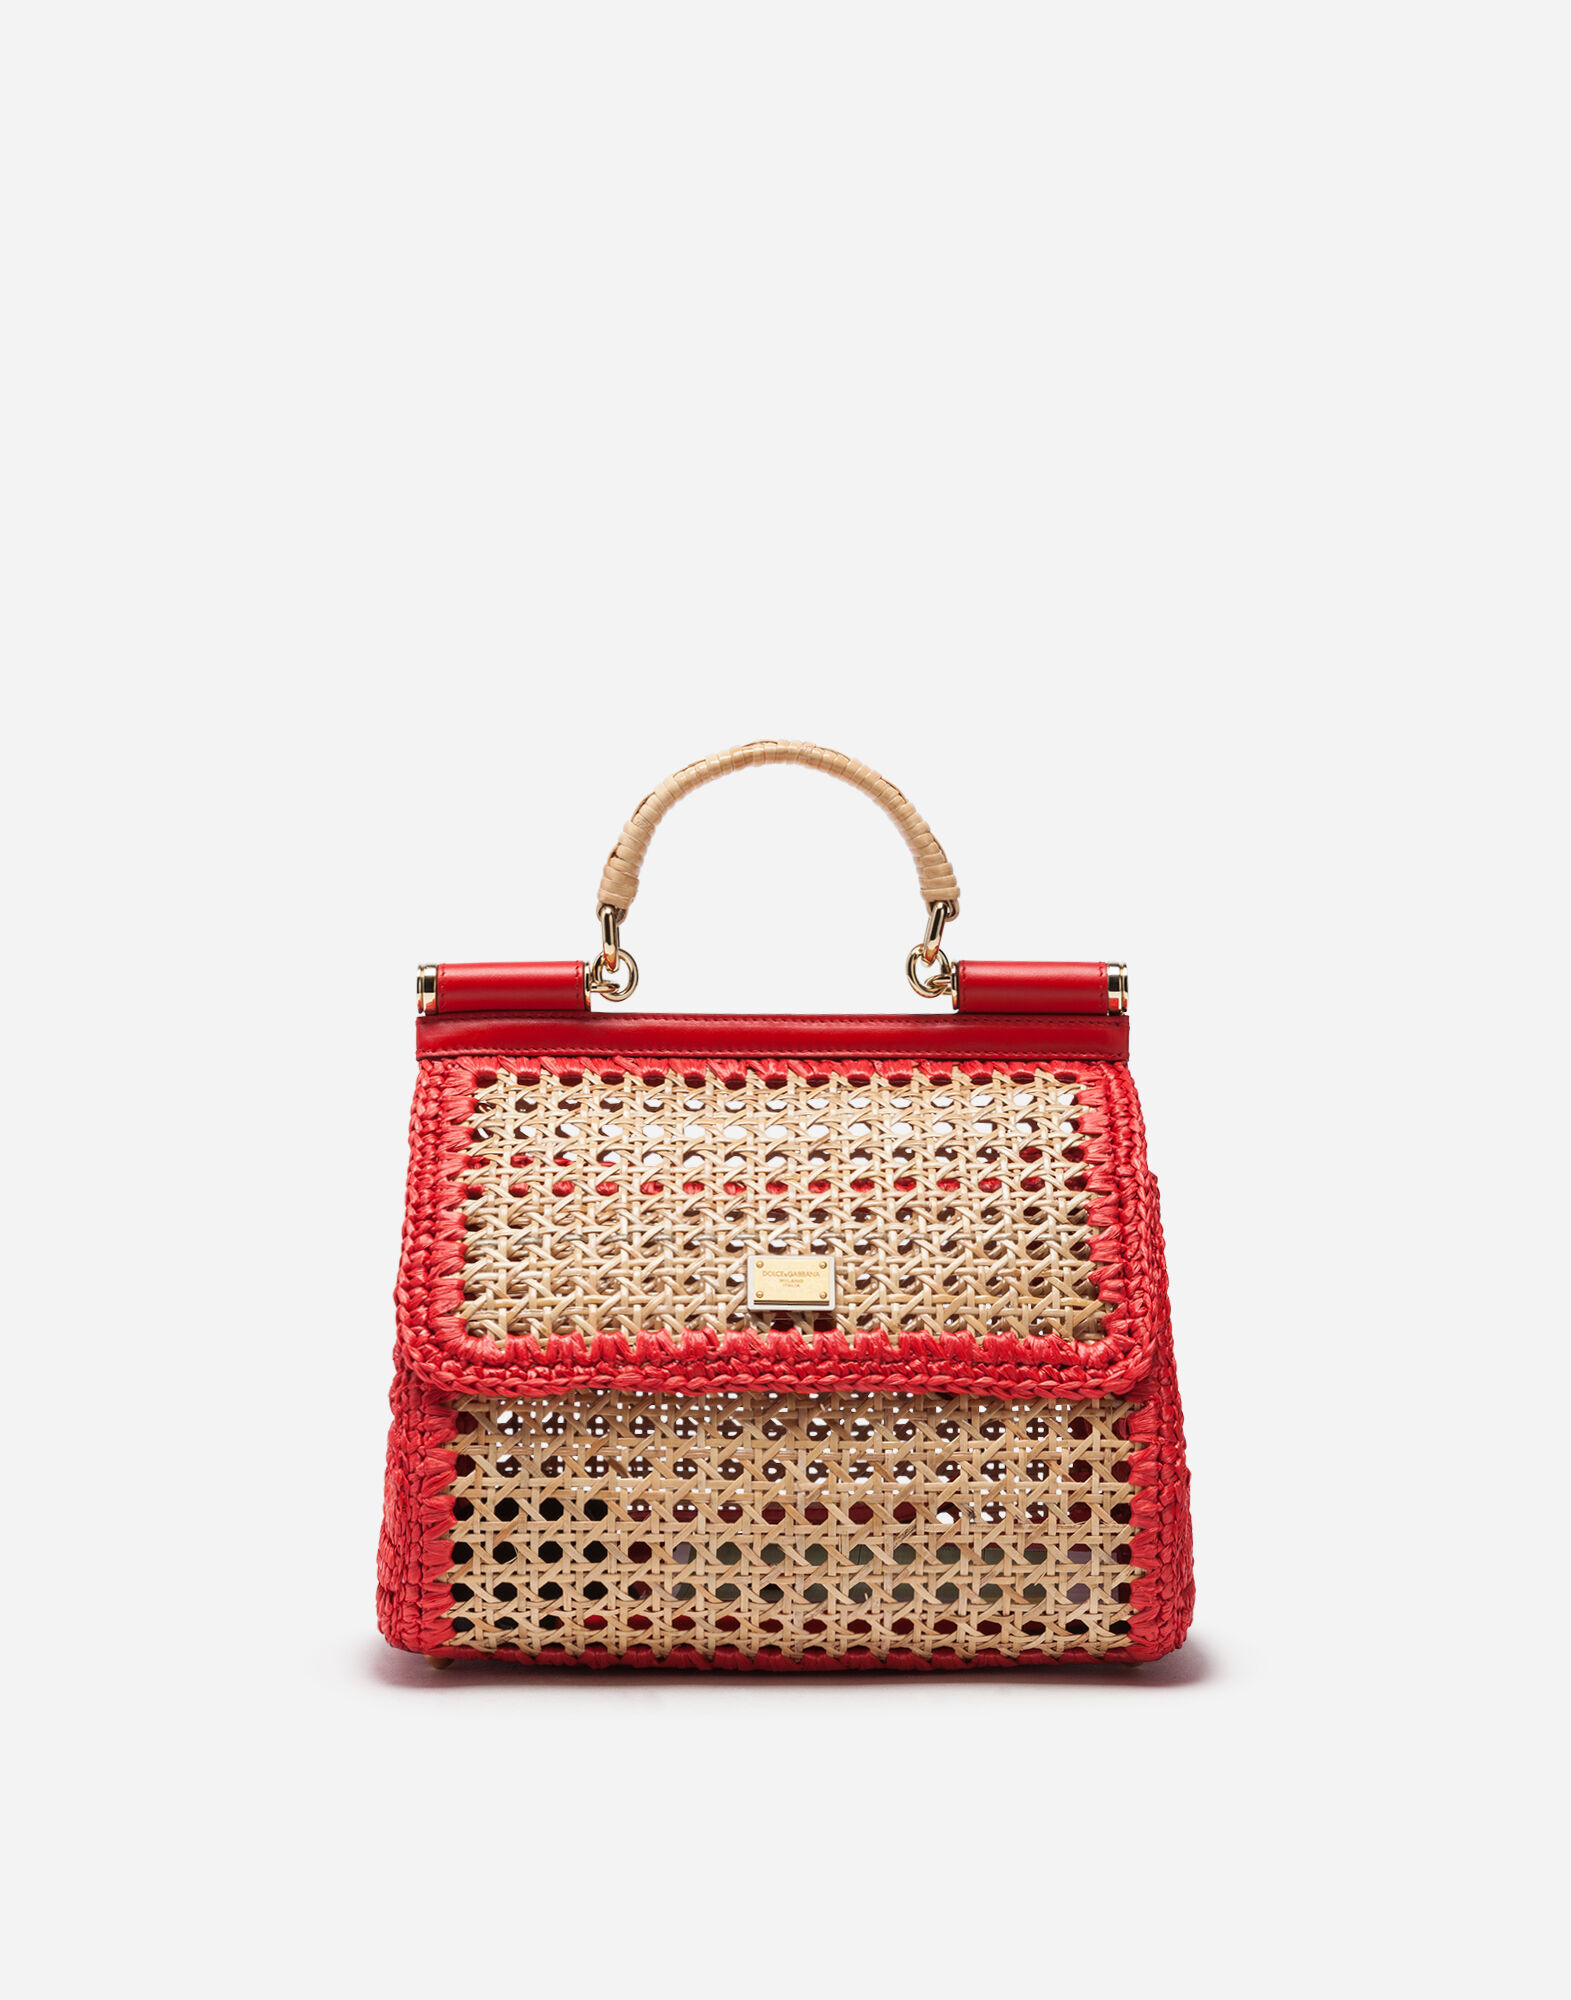 Borse Bag Sicily amp;gabbana Dolce Donna 5Xw6qT